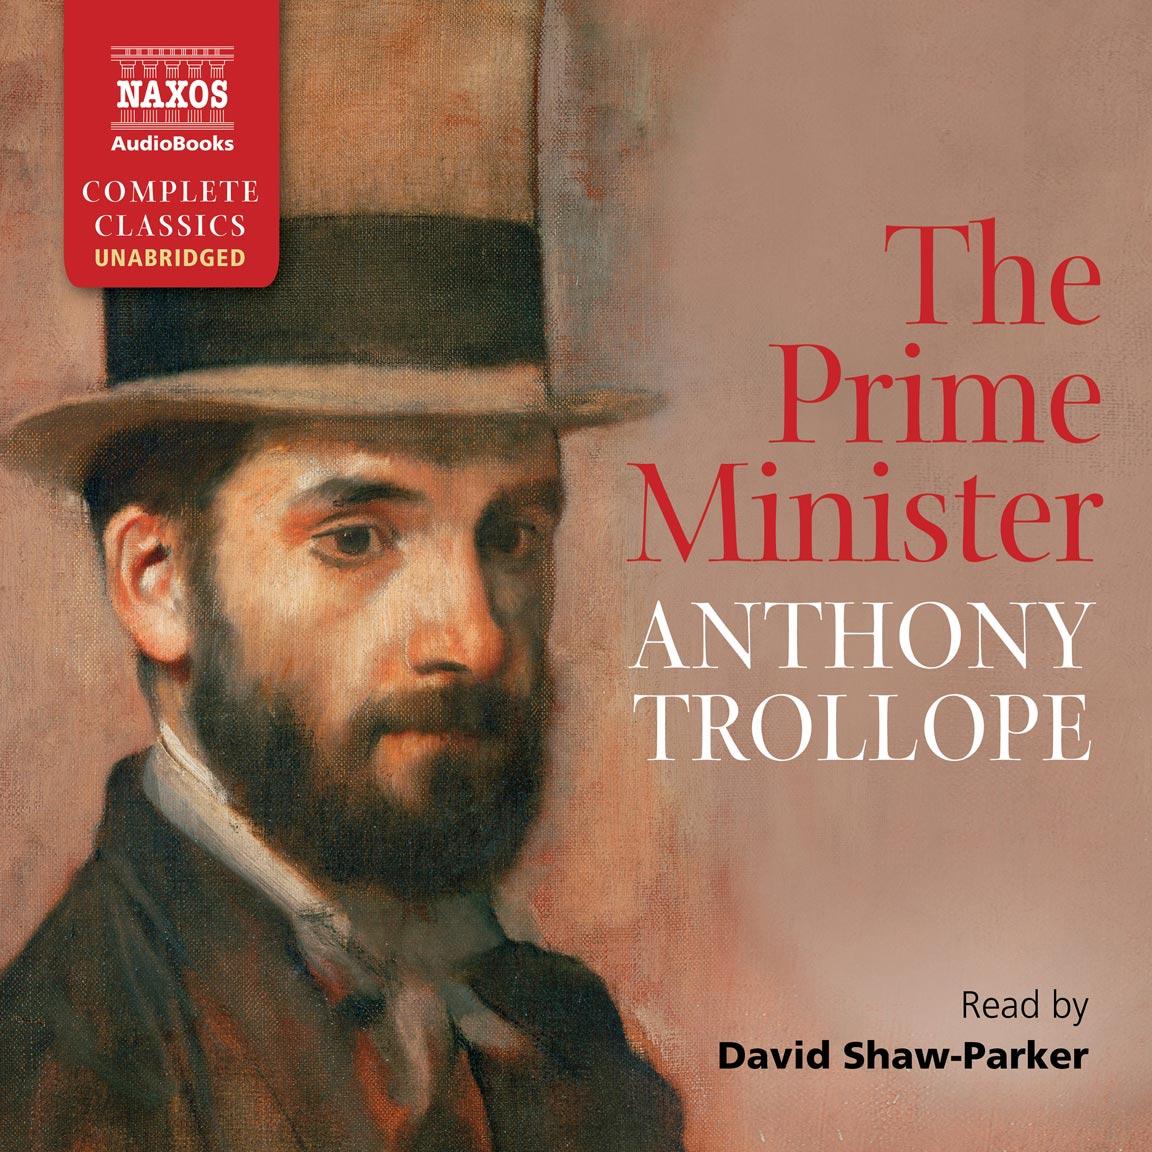 The Prime Minister (unabridged)